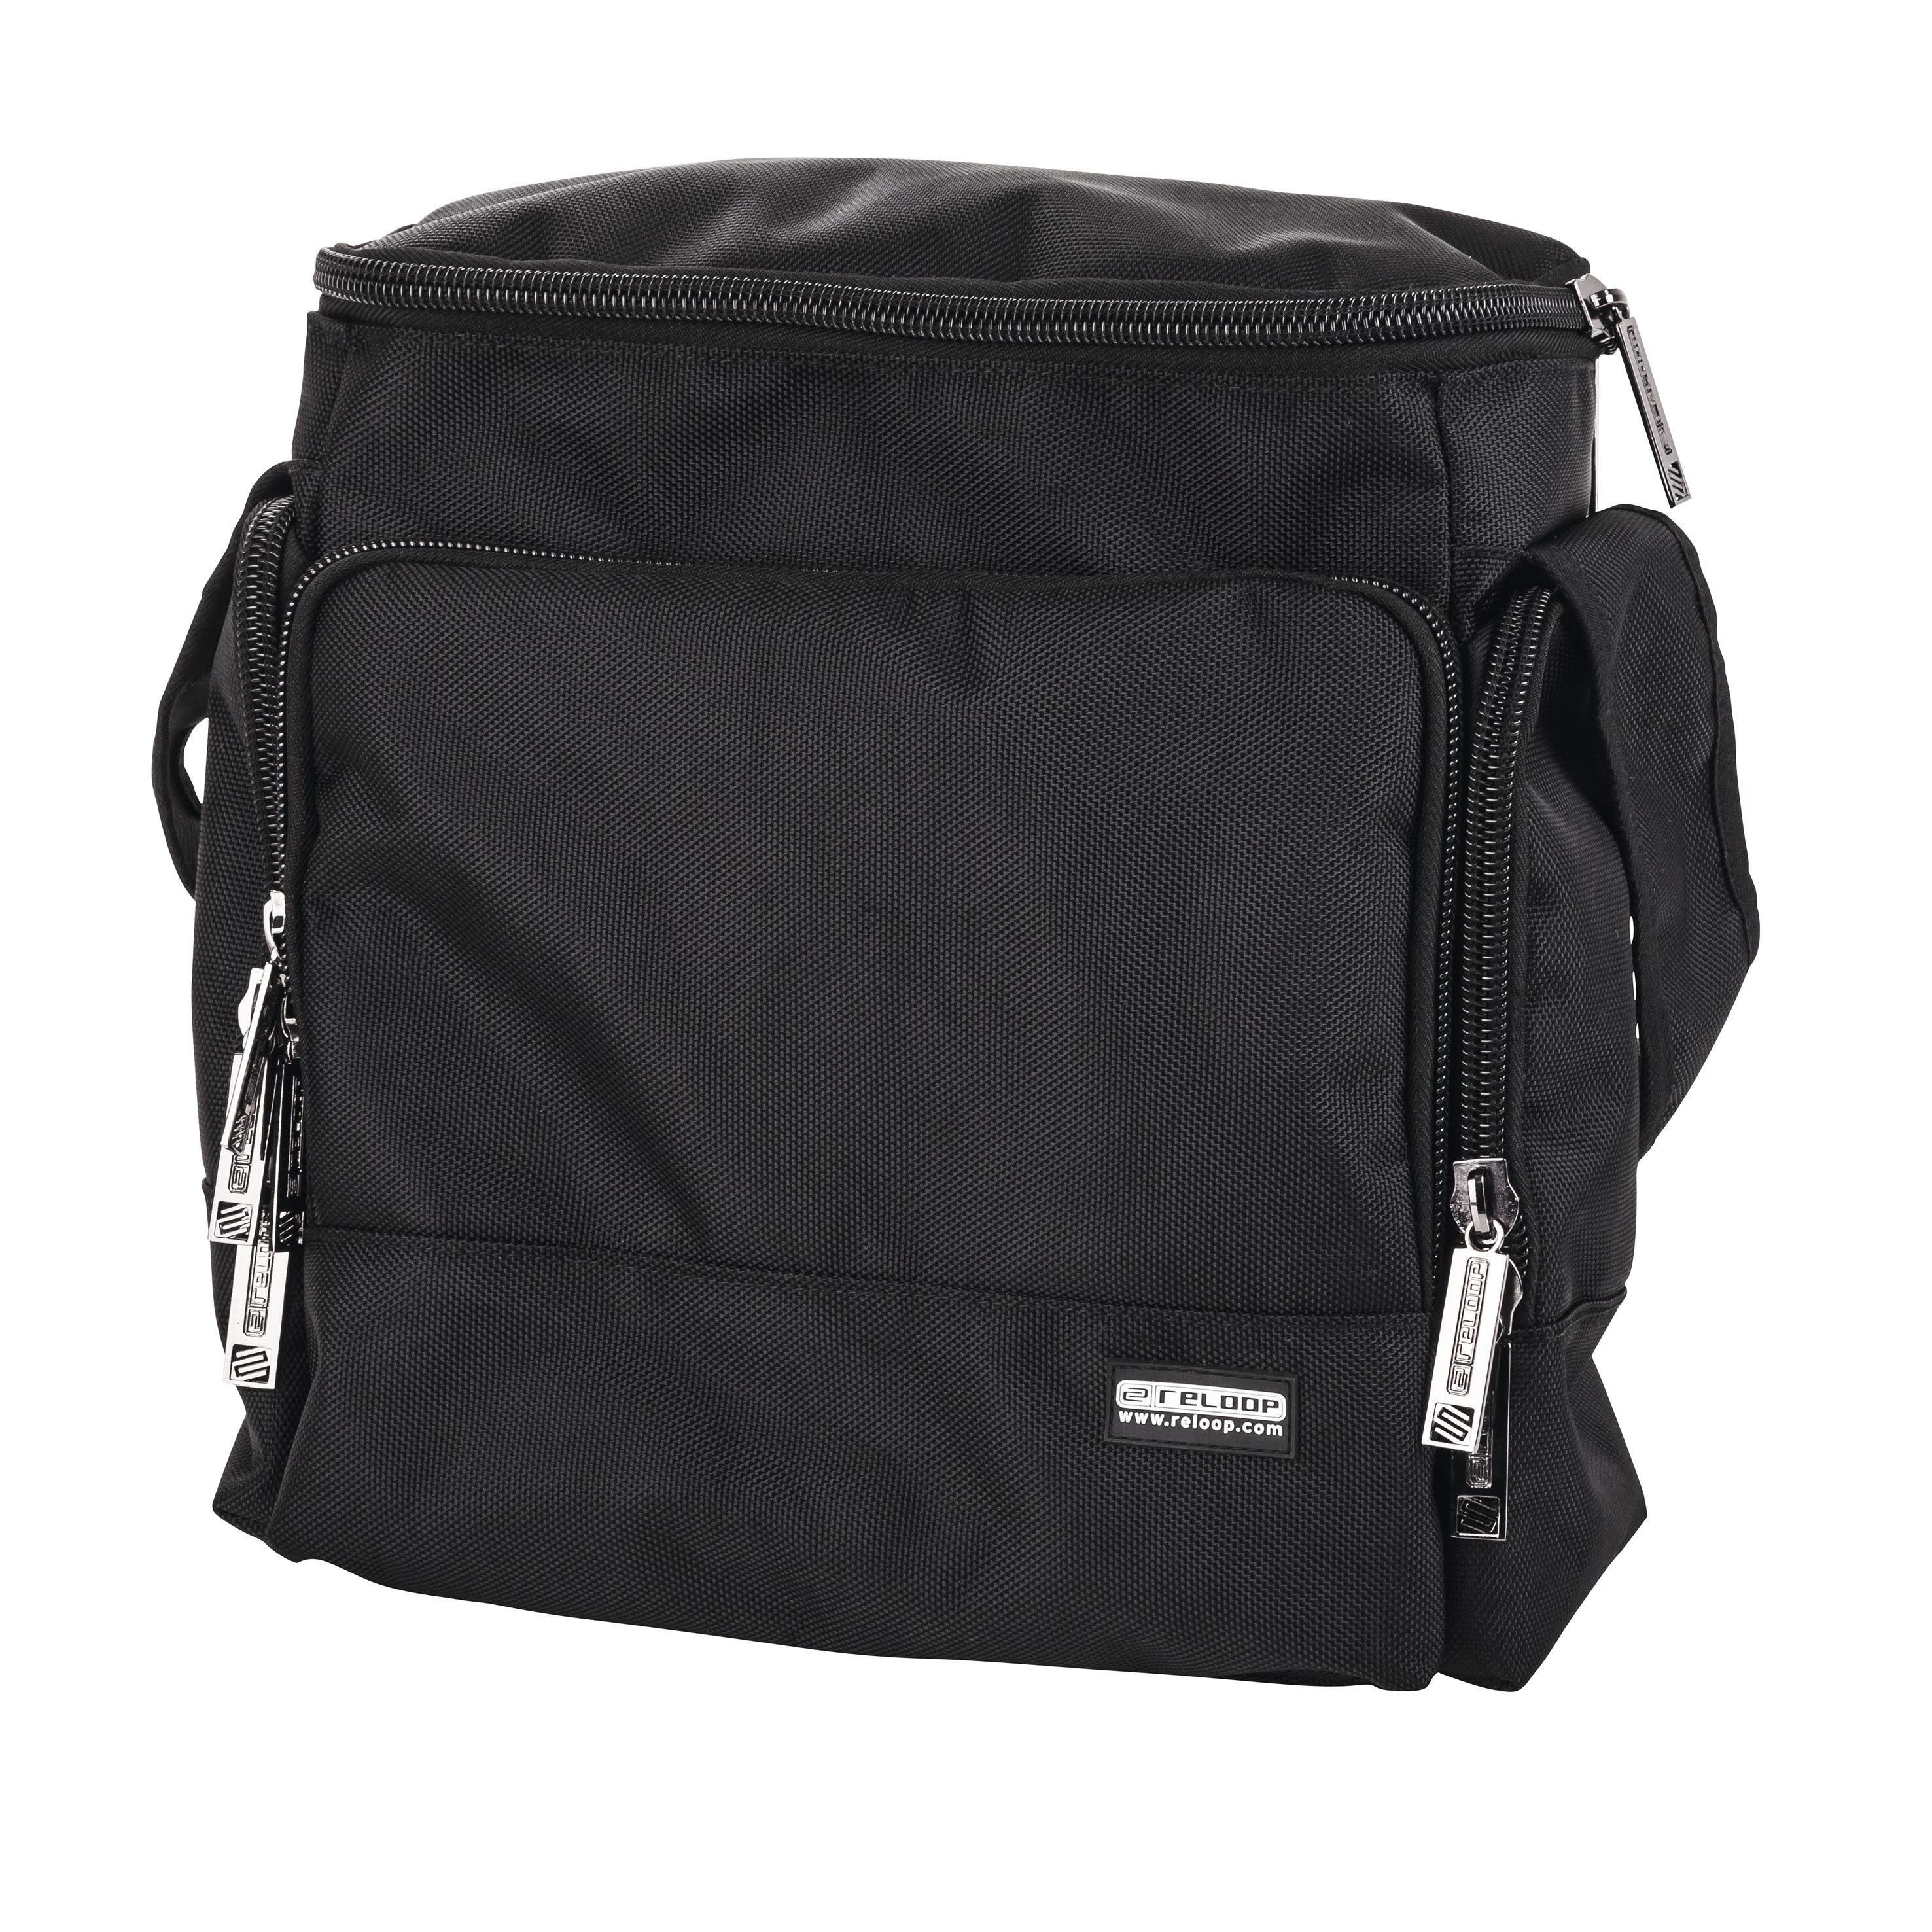 2f5243a047 Panska taska na laptop